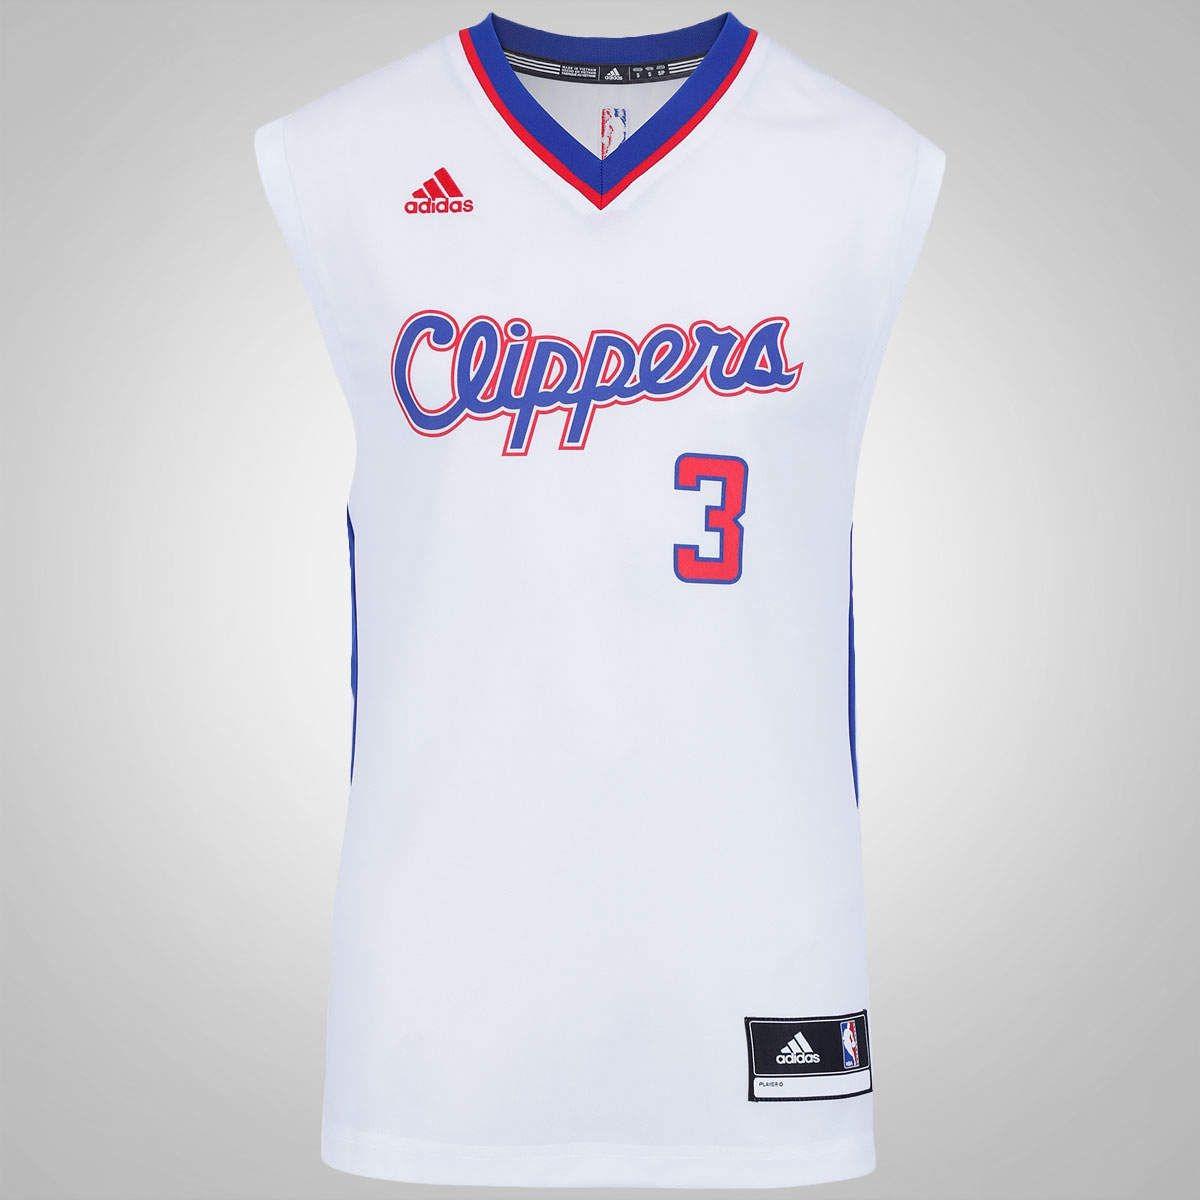 e918b35cf camisa basquete adidas nba los angeles clippers nº3 paul cnf. Carregando  zoom.